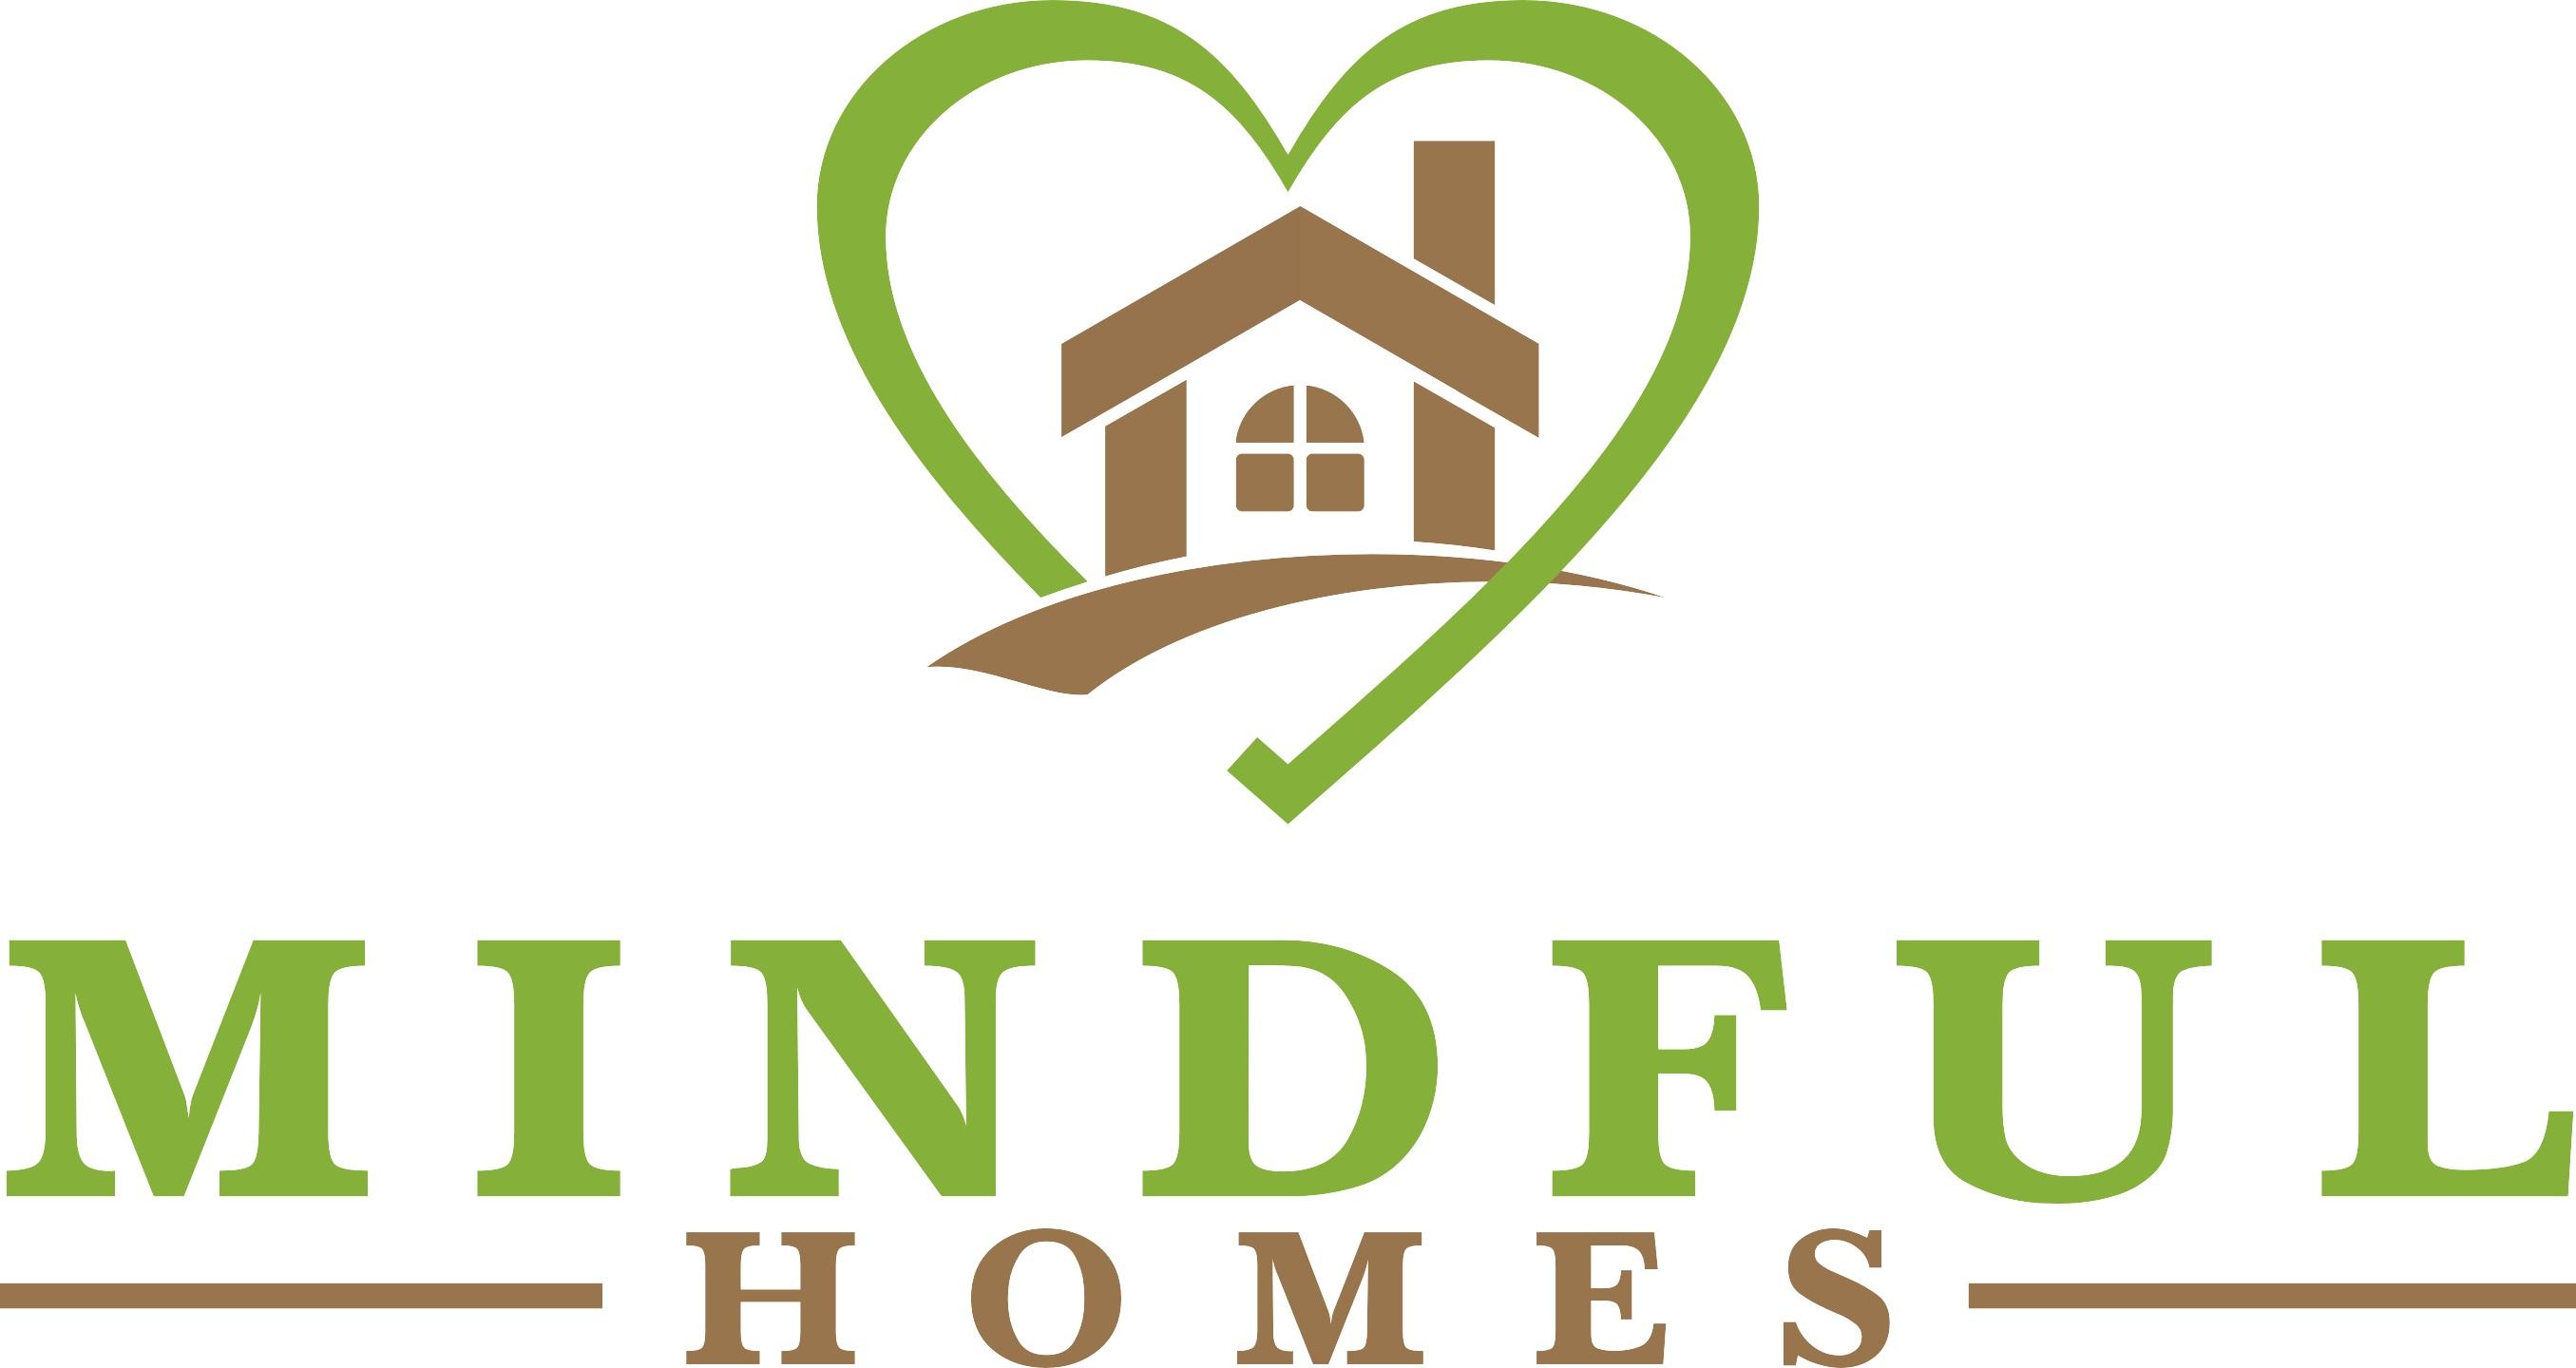 MINDFUL HOMES